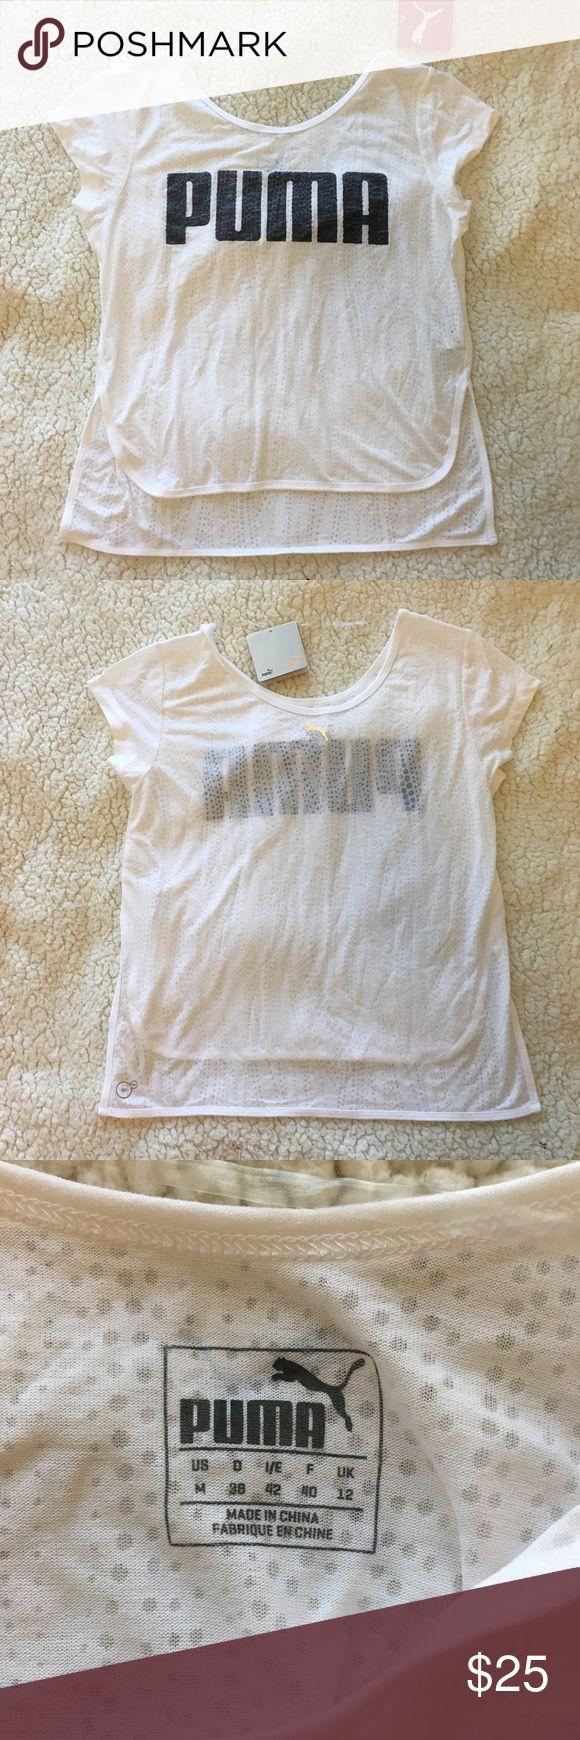 NWT Puma t shirt NWT white Puma shirt. Writing is a faded black/grey color Puma Tops Tees - Short Sleeve